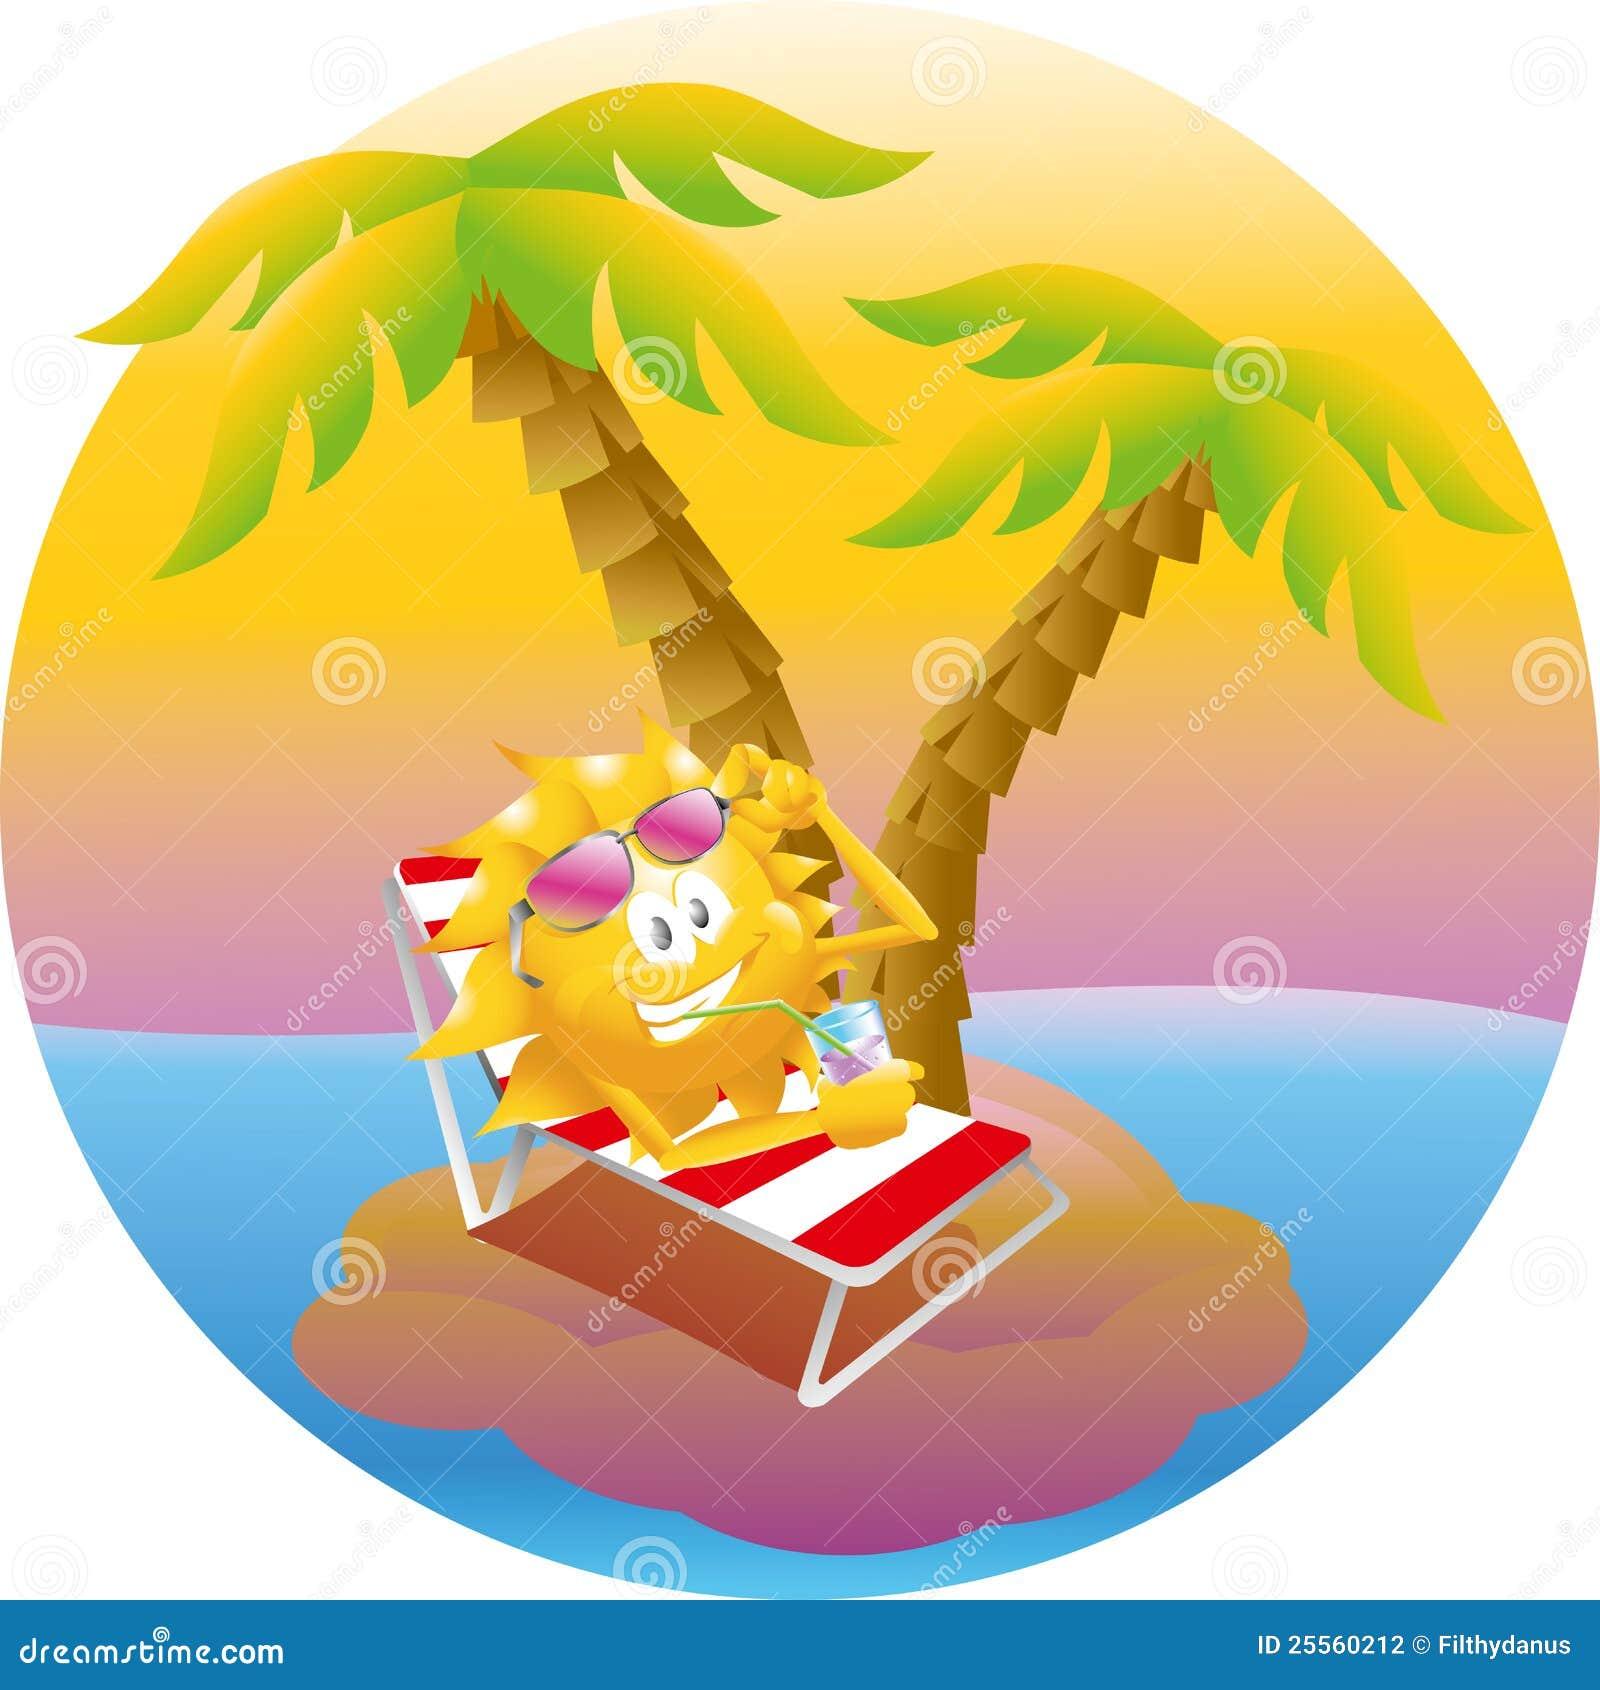 sun on vacation island stock vector illustration of Happy Family Clip Art happy sun clip art png